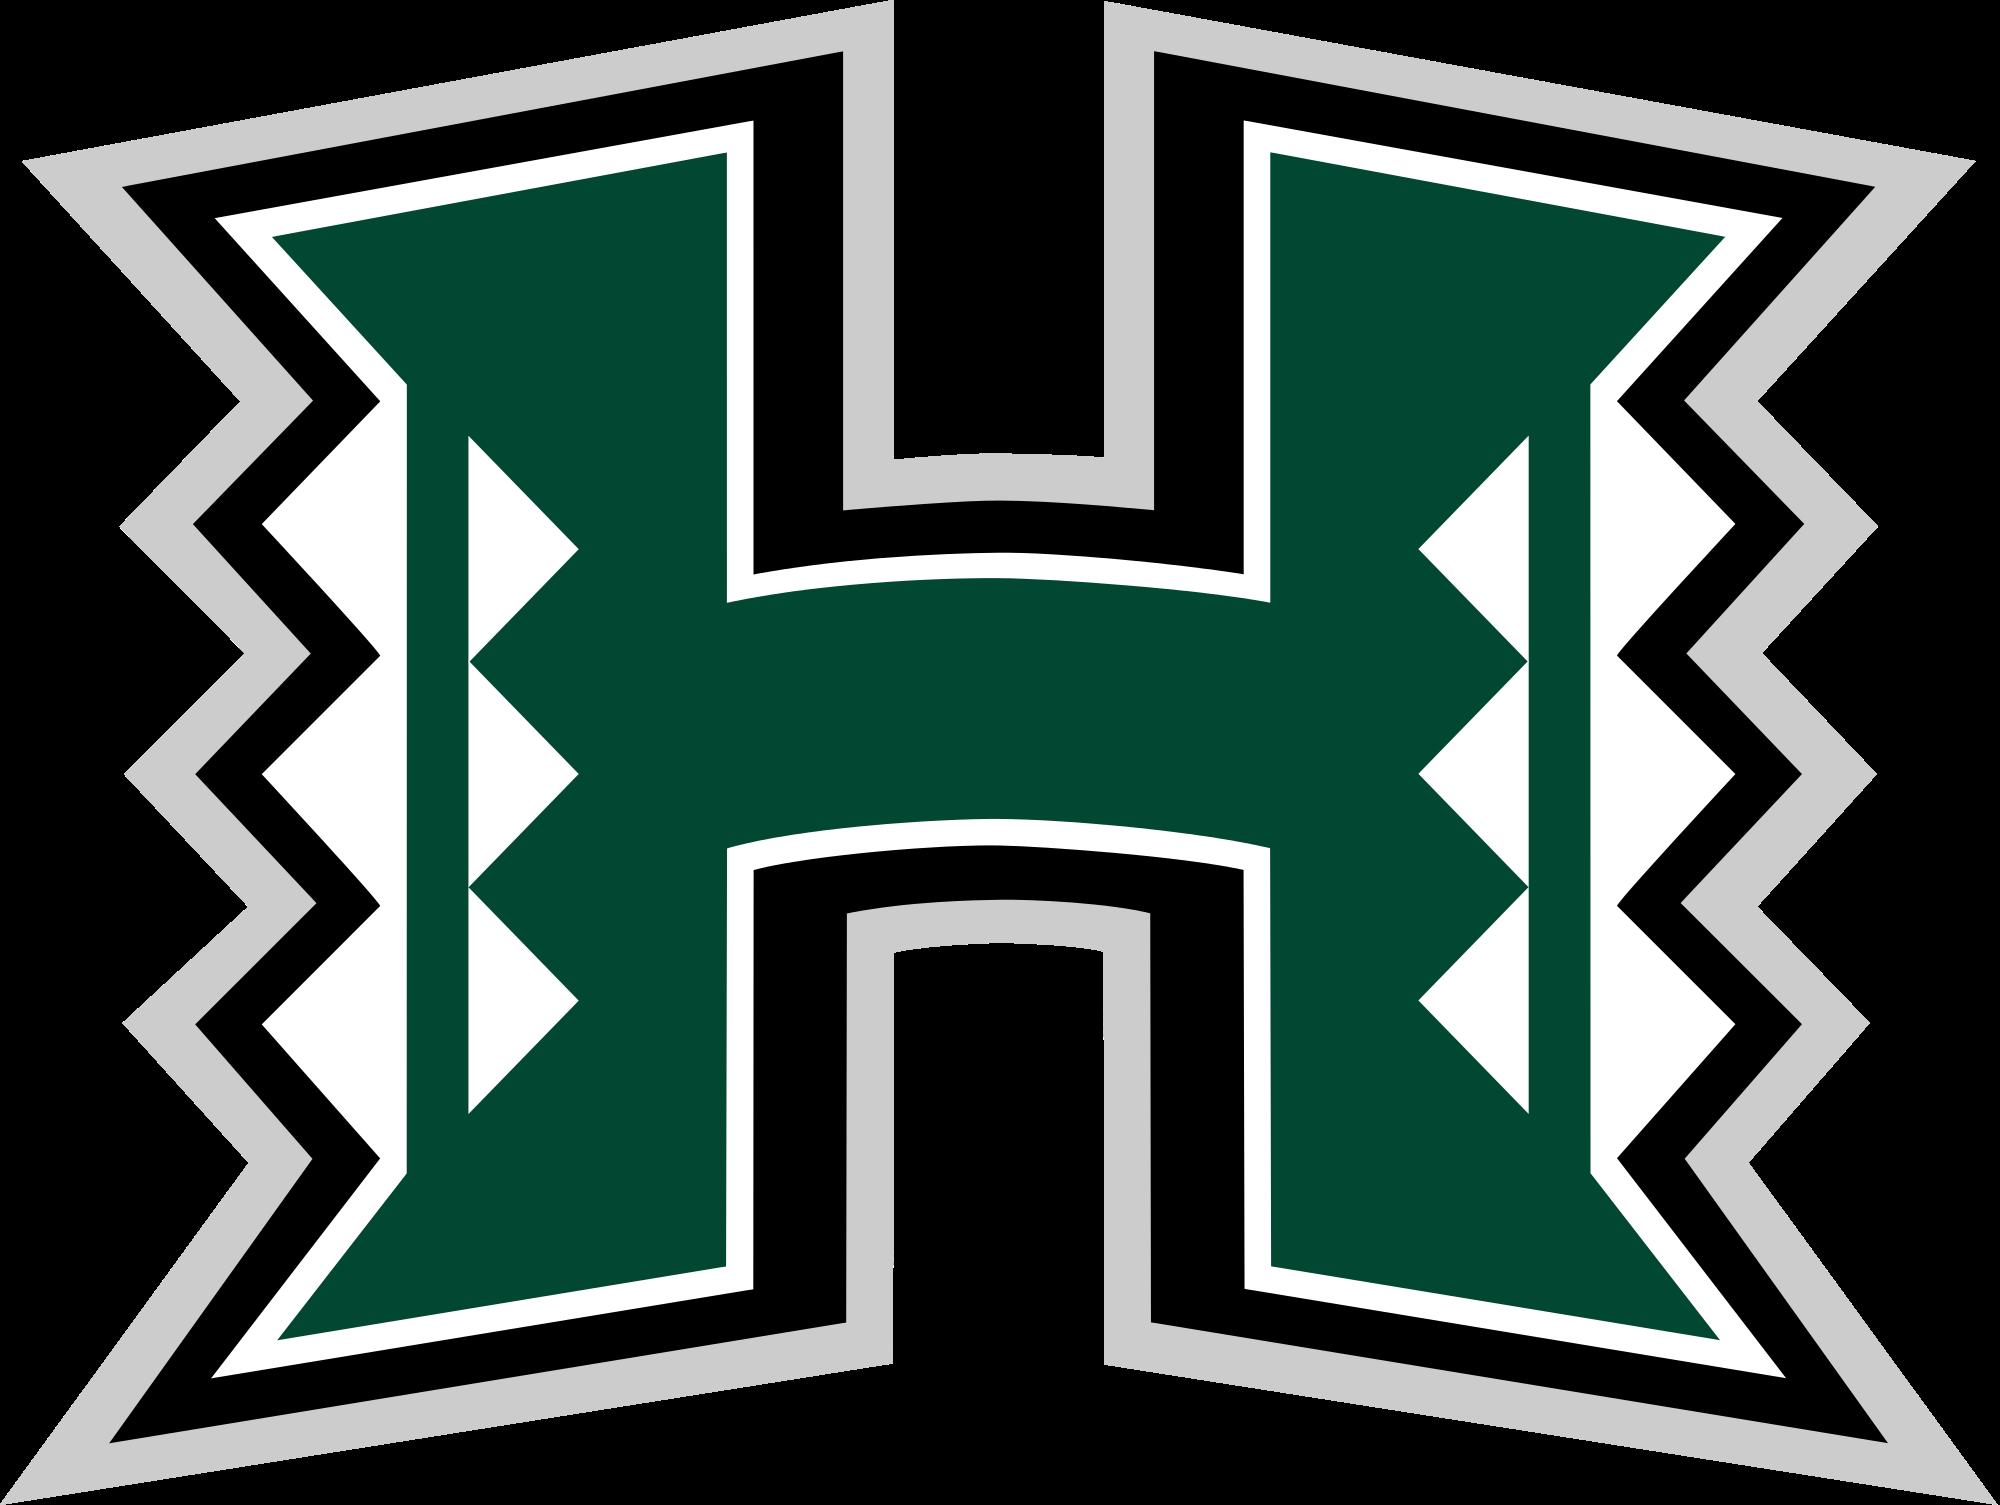 Warrior clipart polynesian. Football hall of fame